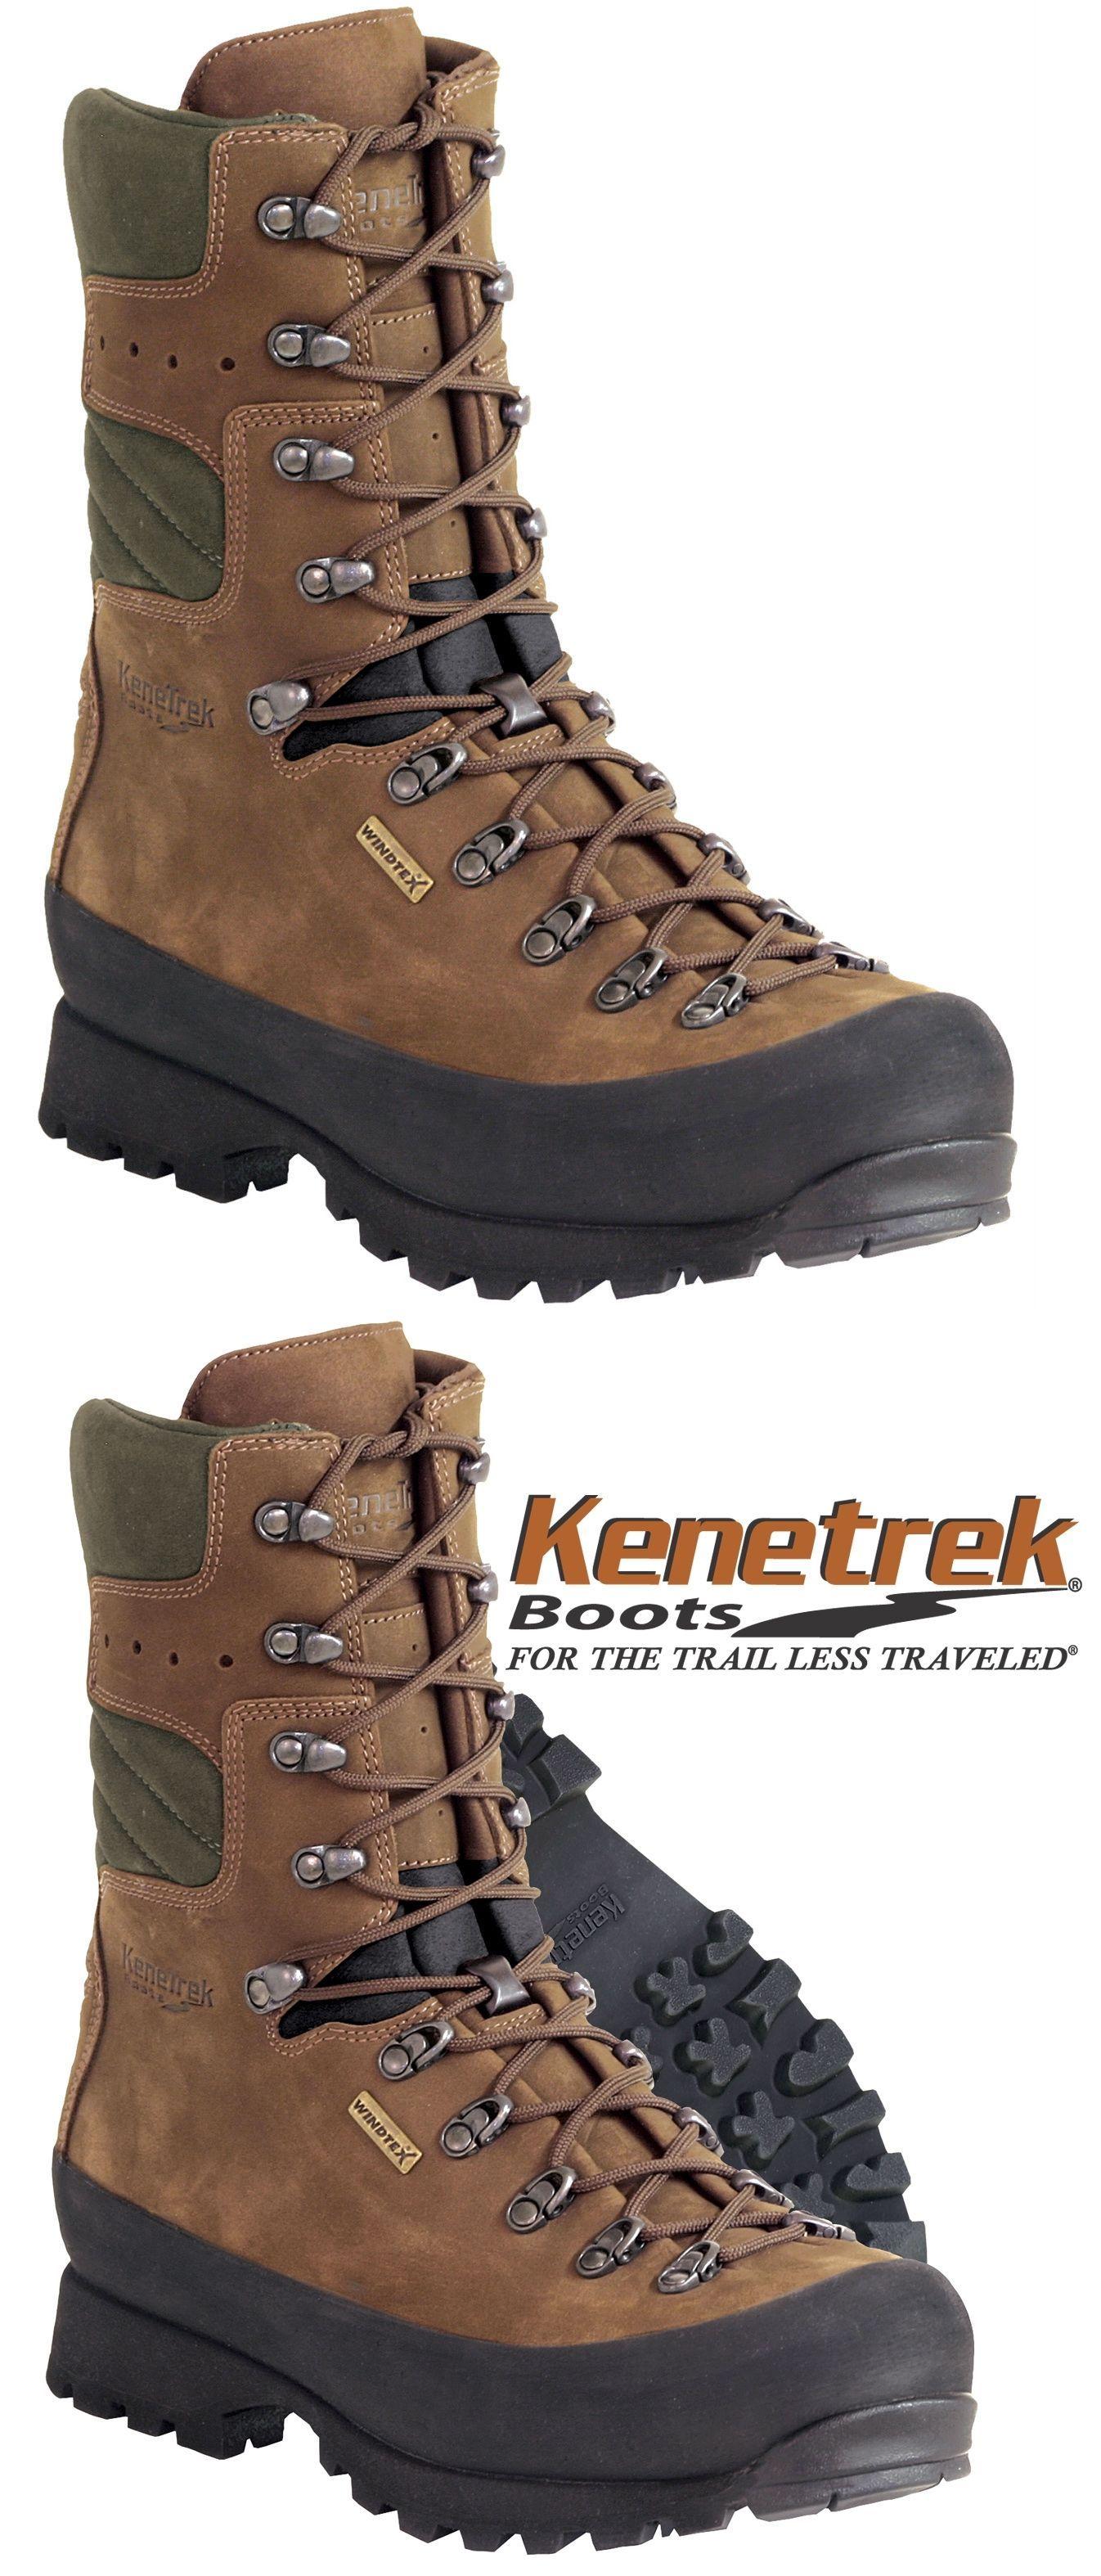 dd82ed8bfcf Other Camping Hiking Clothing 27362: Mens Kenetrek Mountain Extreme ...